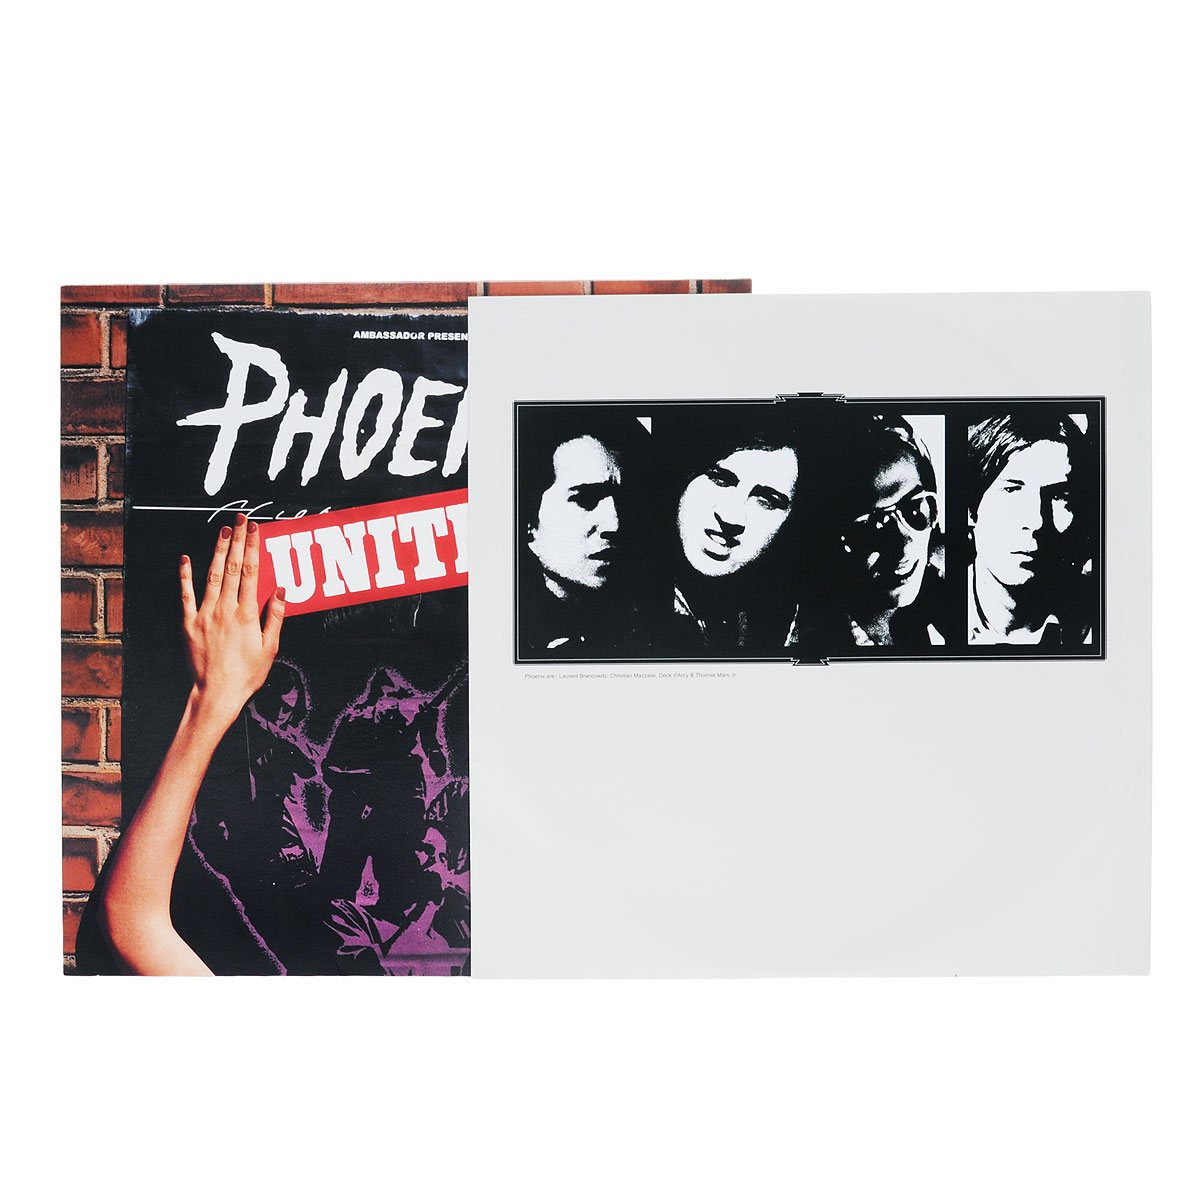 Phoenix.  United (LP) Warner Music,Parlophone